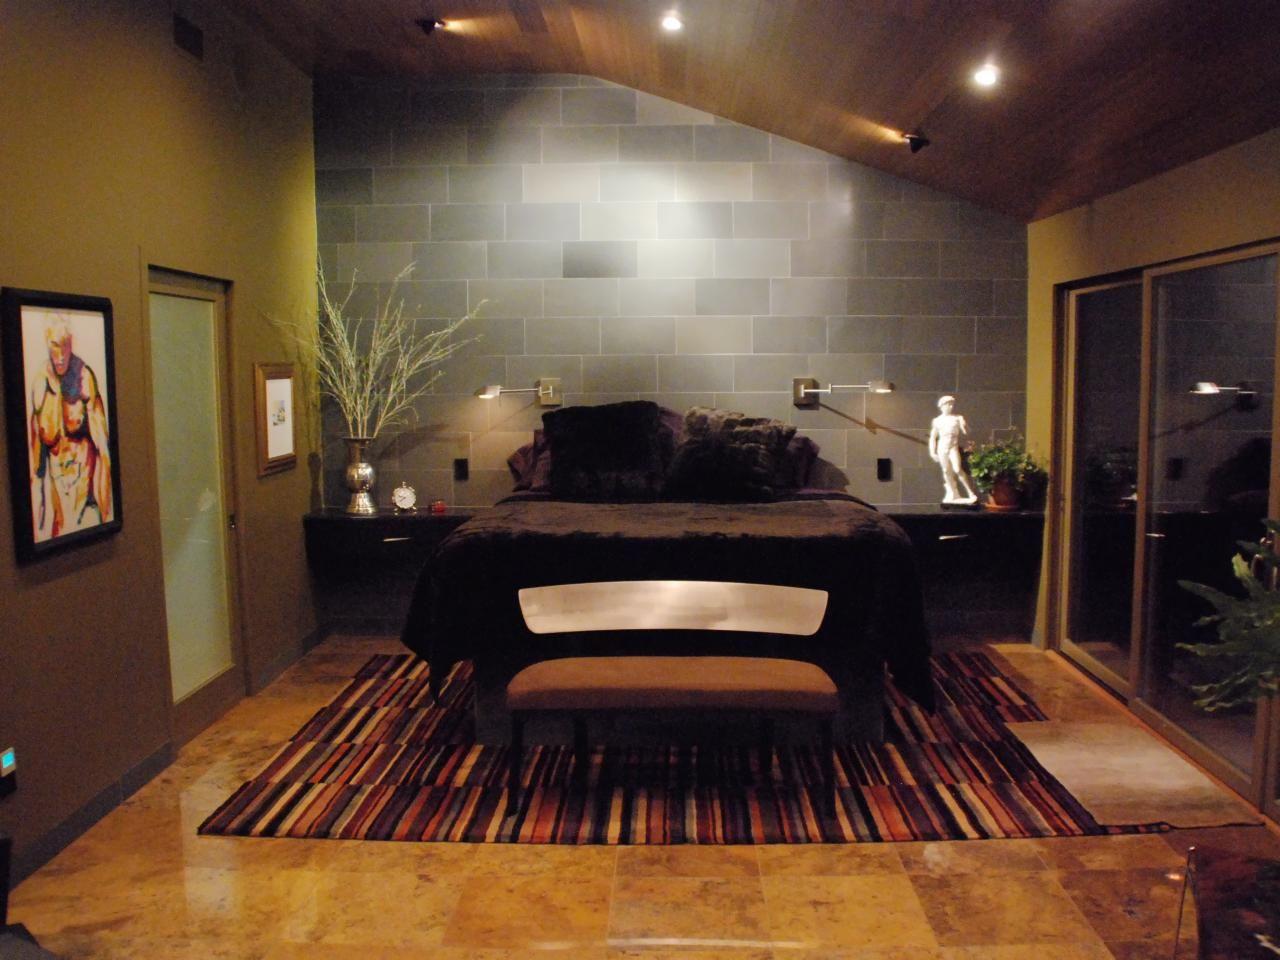 bedroom flooring. Ditch the carpet 12 bedroom flooring options travertine floors ditch  Master Bedroom Floor Tiles Gallery Tile Flooring Design Ideas